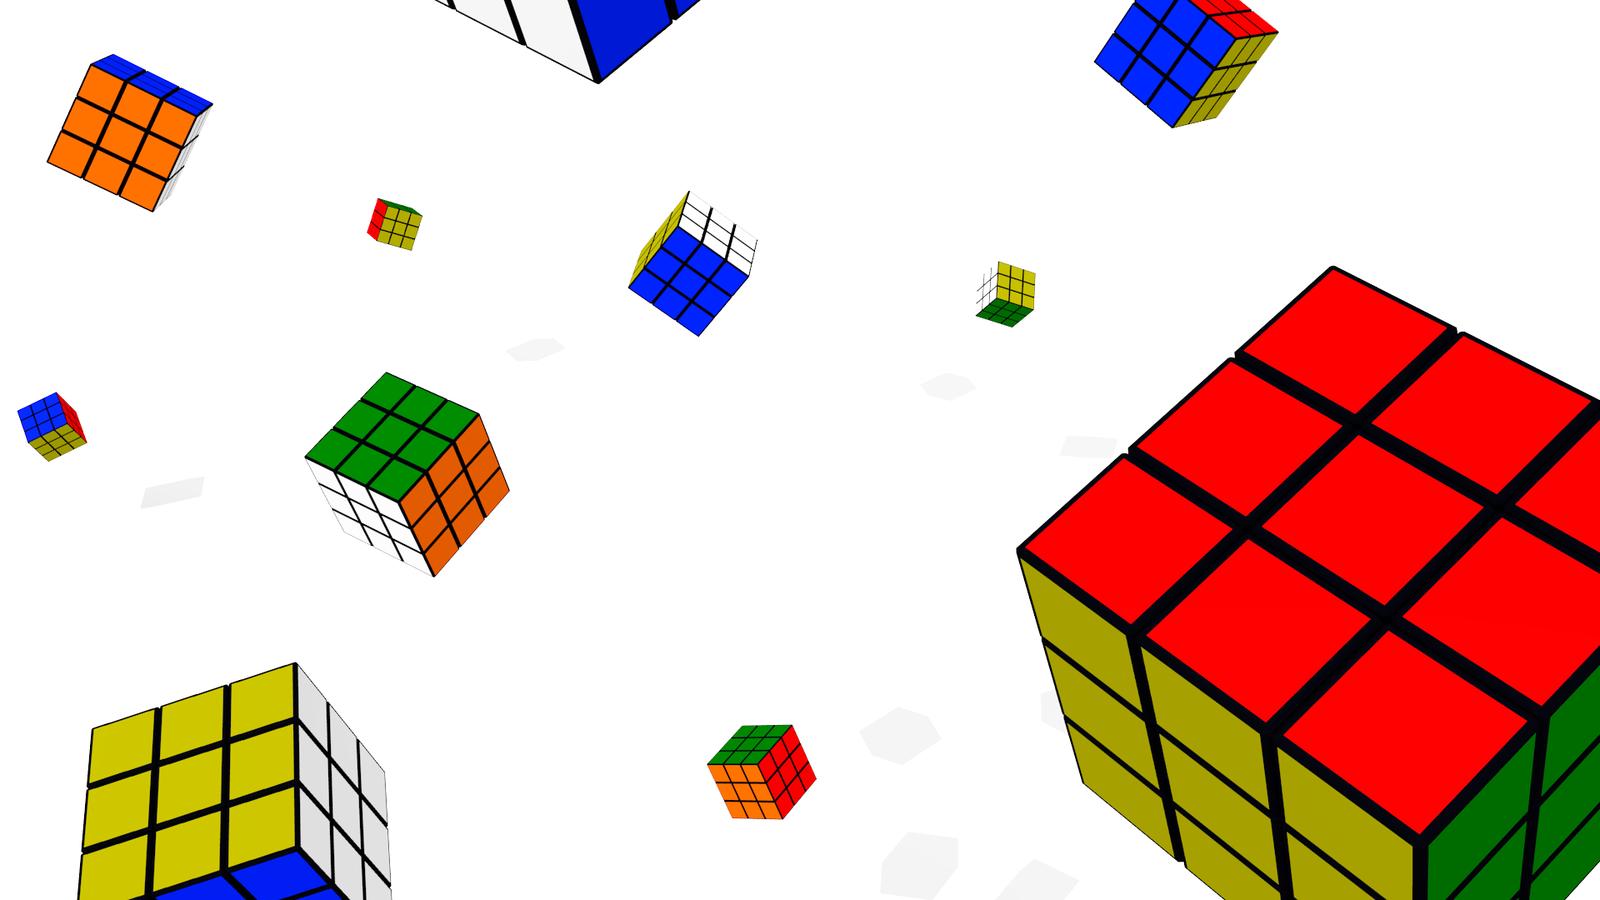 Rubiks cube wallpaper by TangoOscarMik3 1600x900